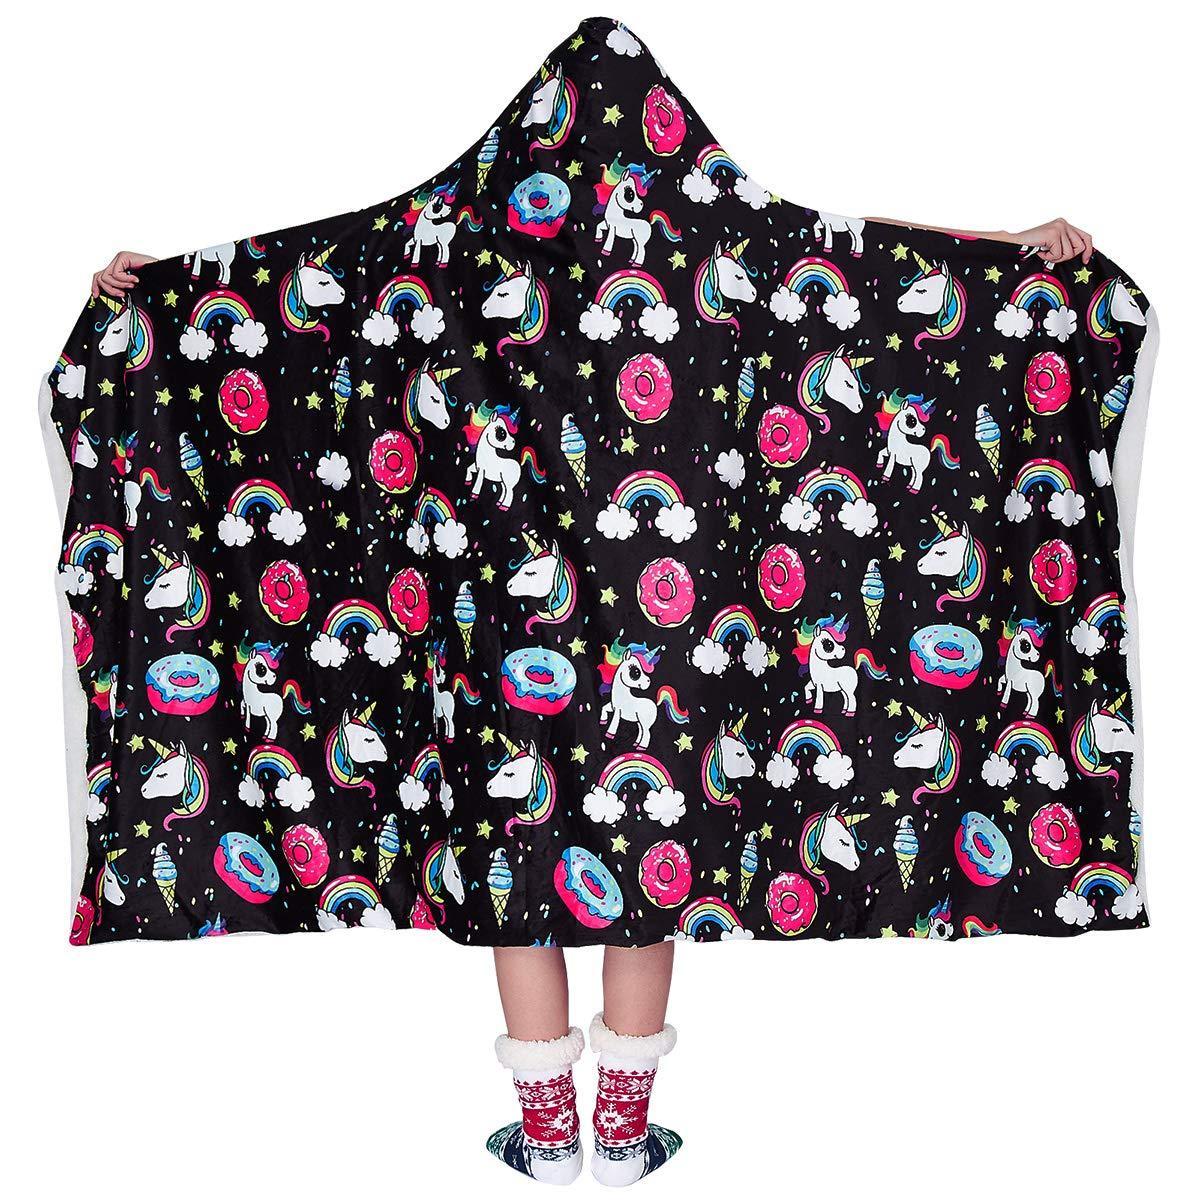 Loveternal Unicorn Graphic Blanket Hoodie for Women Rainbow Donut Cloaking Cabin Throw Blanket 3D Plush Small Lucky Star Ice Cream Warm Fleece Wearable Blanket Cuddle Home Black (60\